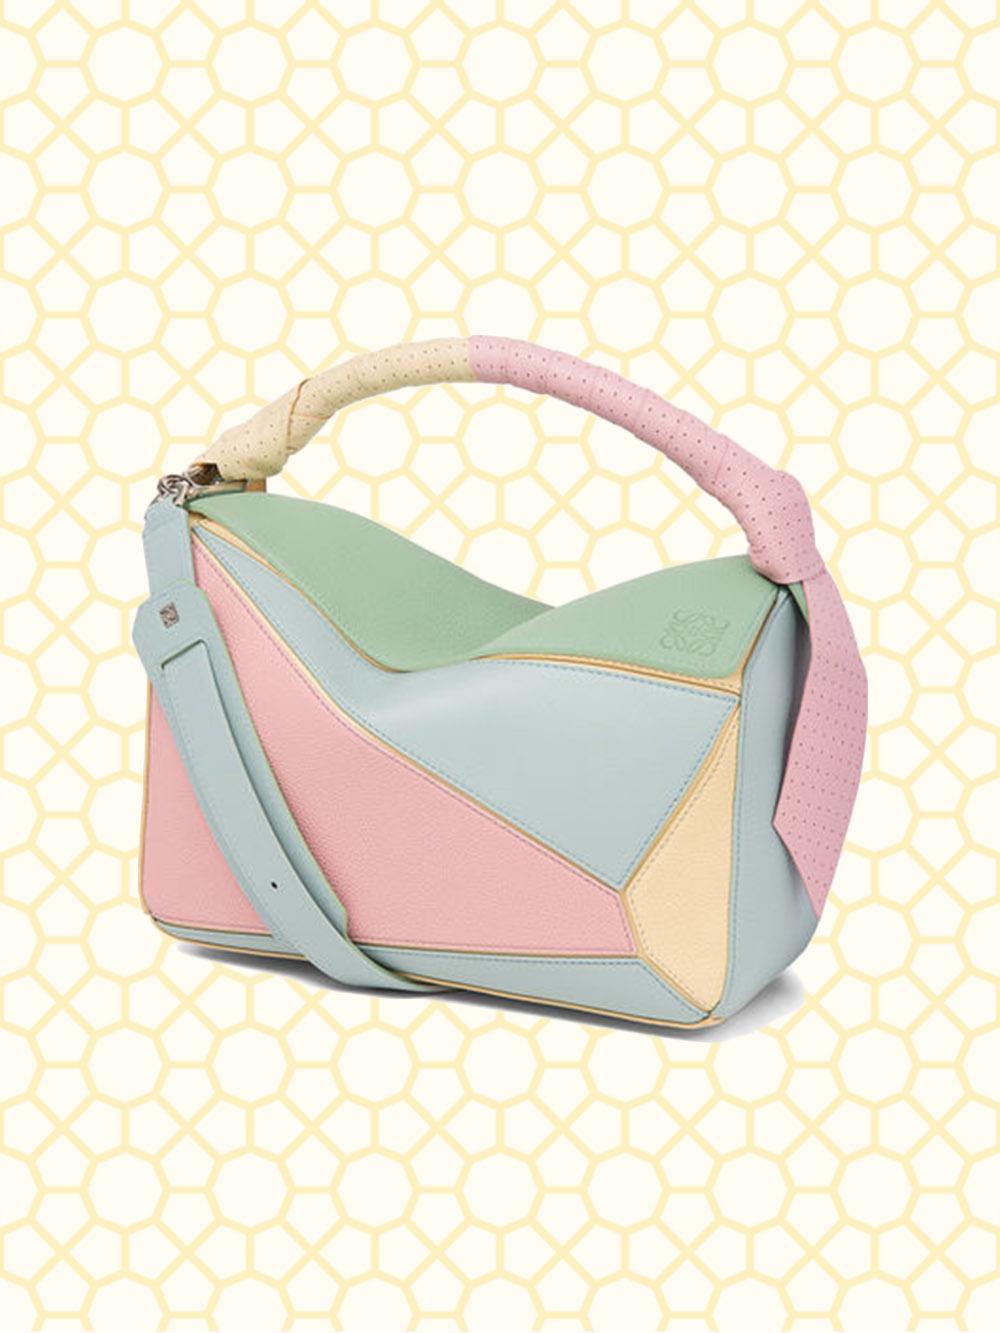 Designer Handbag Wishlist #1 — Cafe Carrie   Fashion Lifestyle Blog